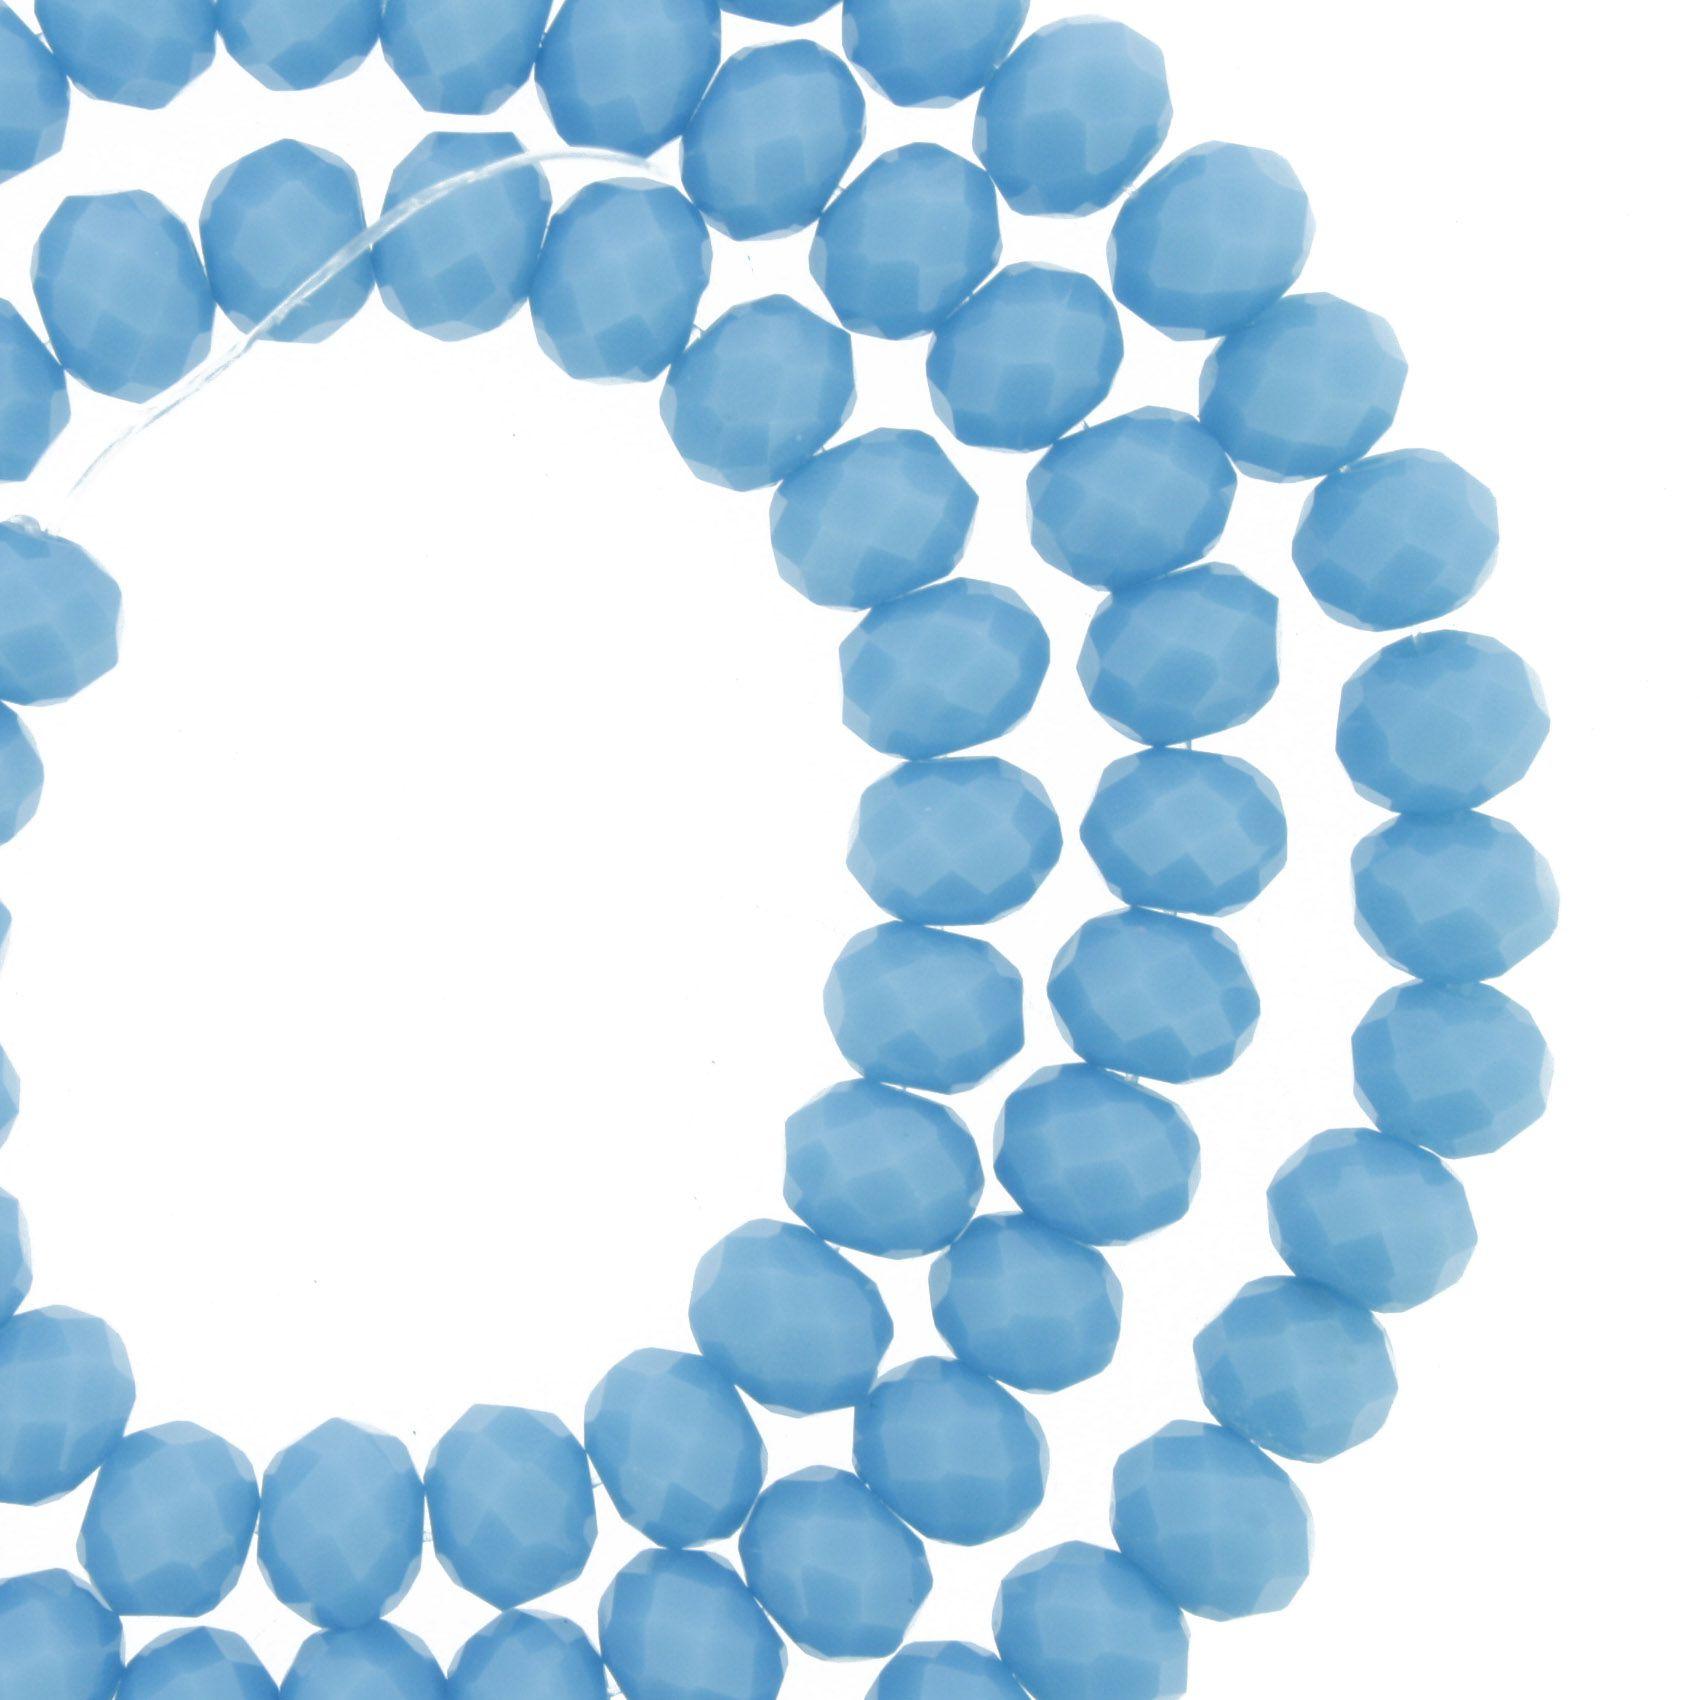 Fio de Cristal - Piatto® - Azul Claro - 6mm  - Universo Religioso® - Artigos de Umbanda e Candomblé